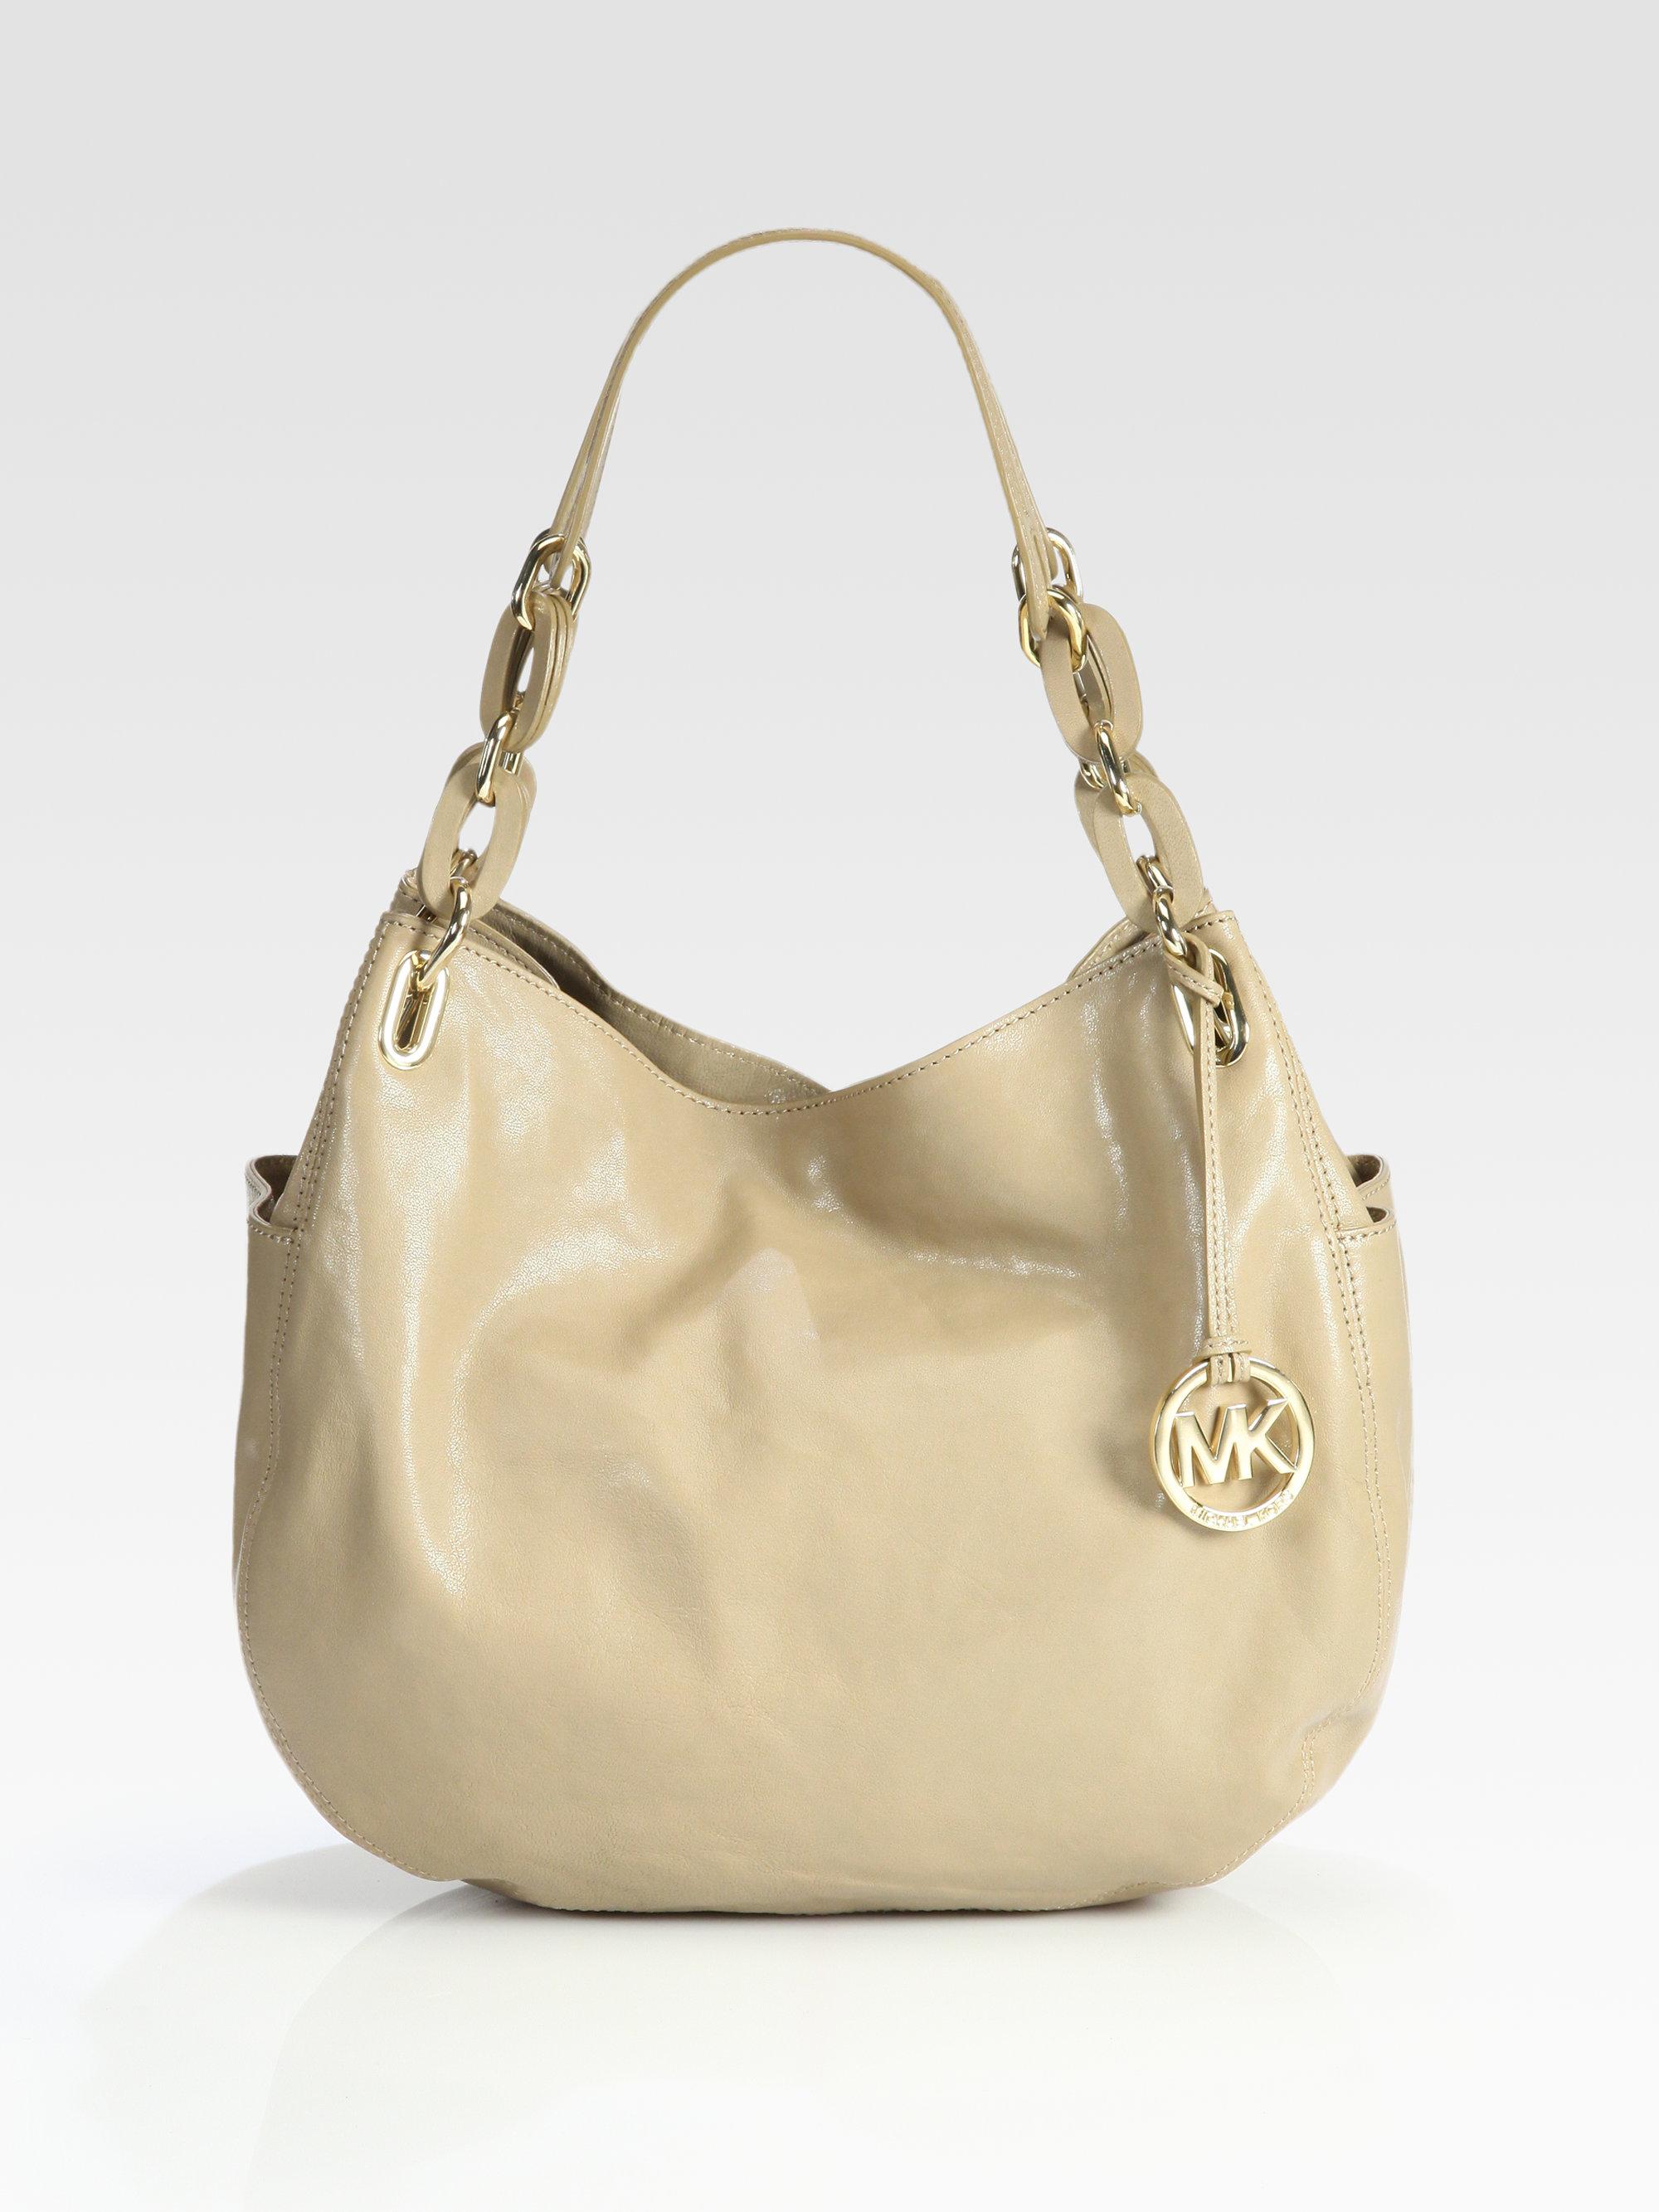 90b7b1bc42a4 ... ireland lyst michael michael kors lilly medium leather shoulder bag in  natural 3d33c 3ec20